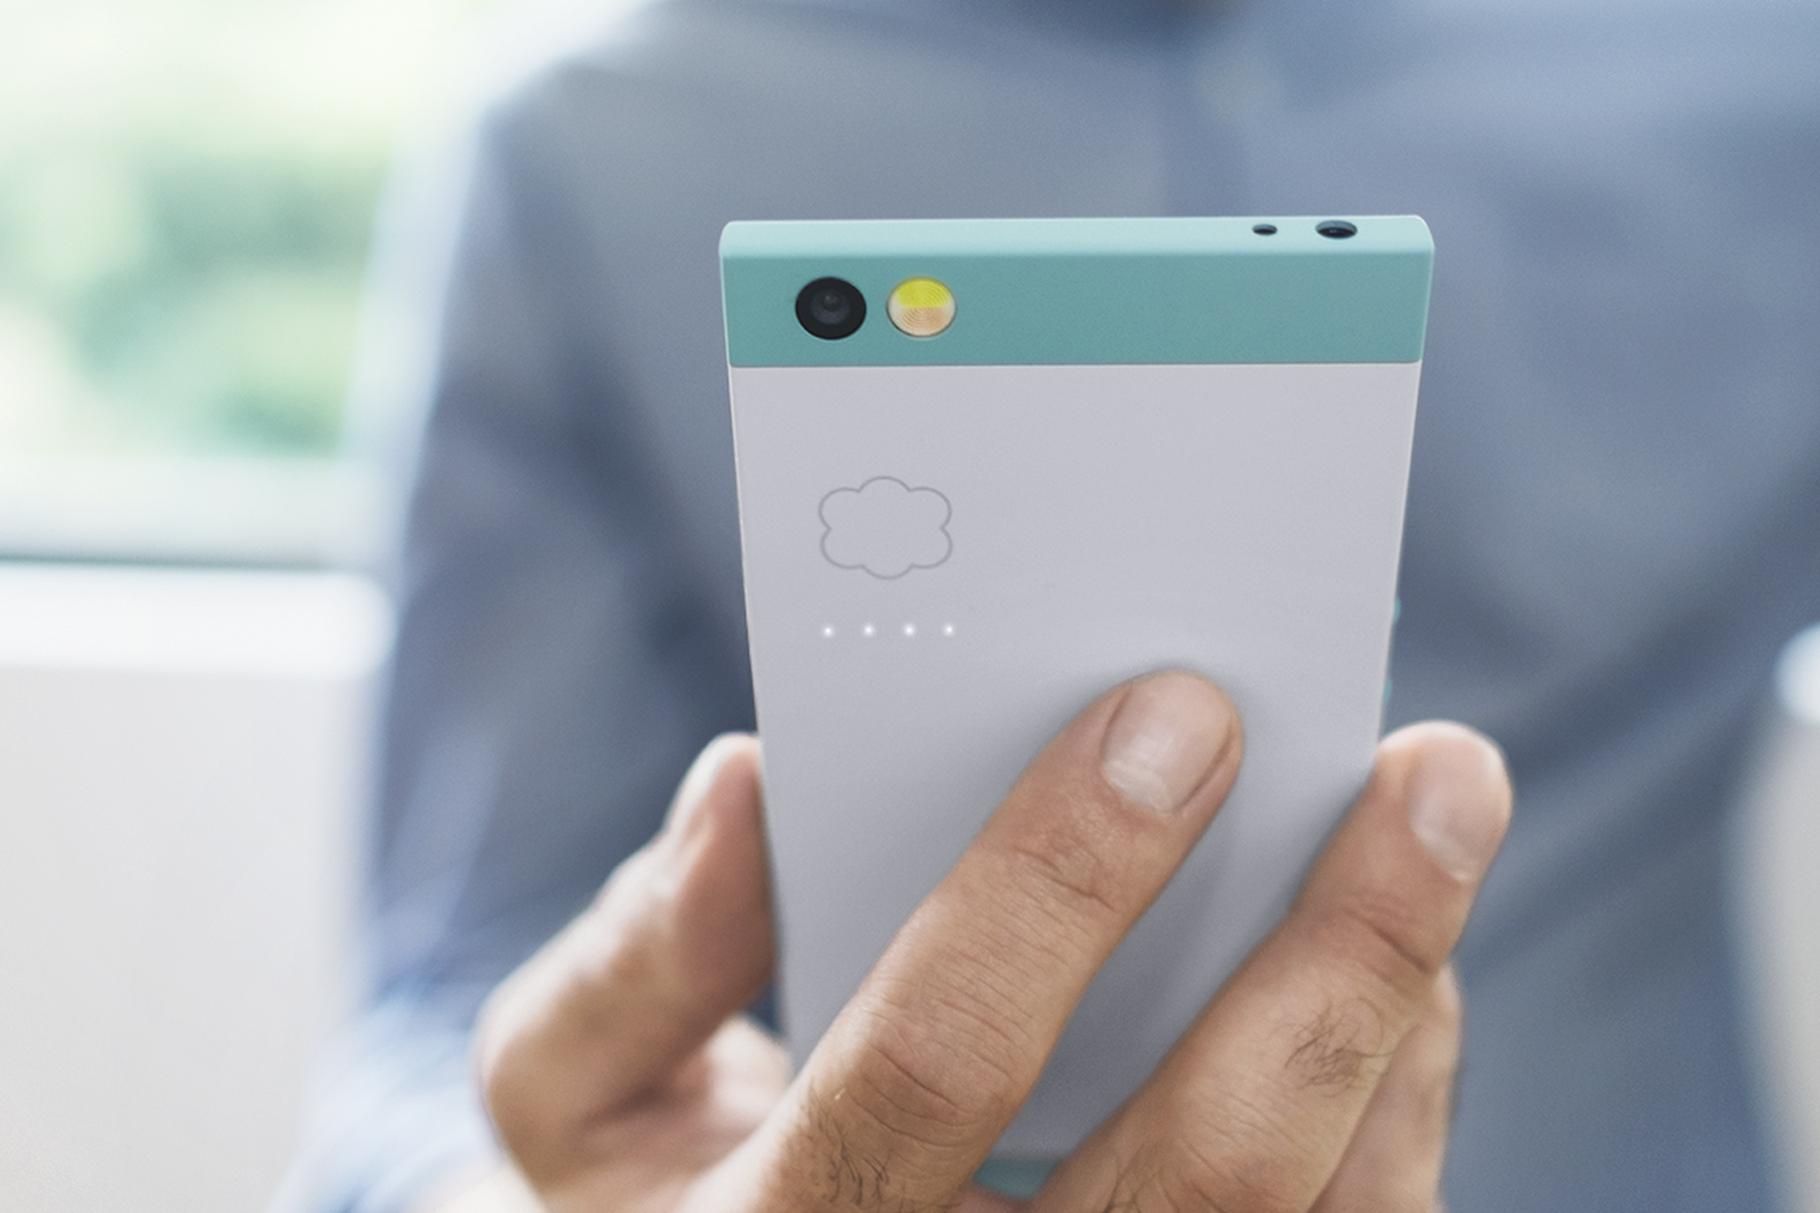 Nextbit's Robin smartphone